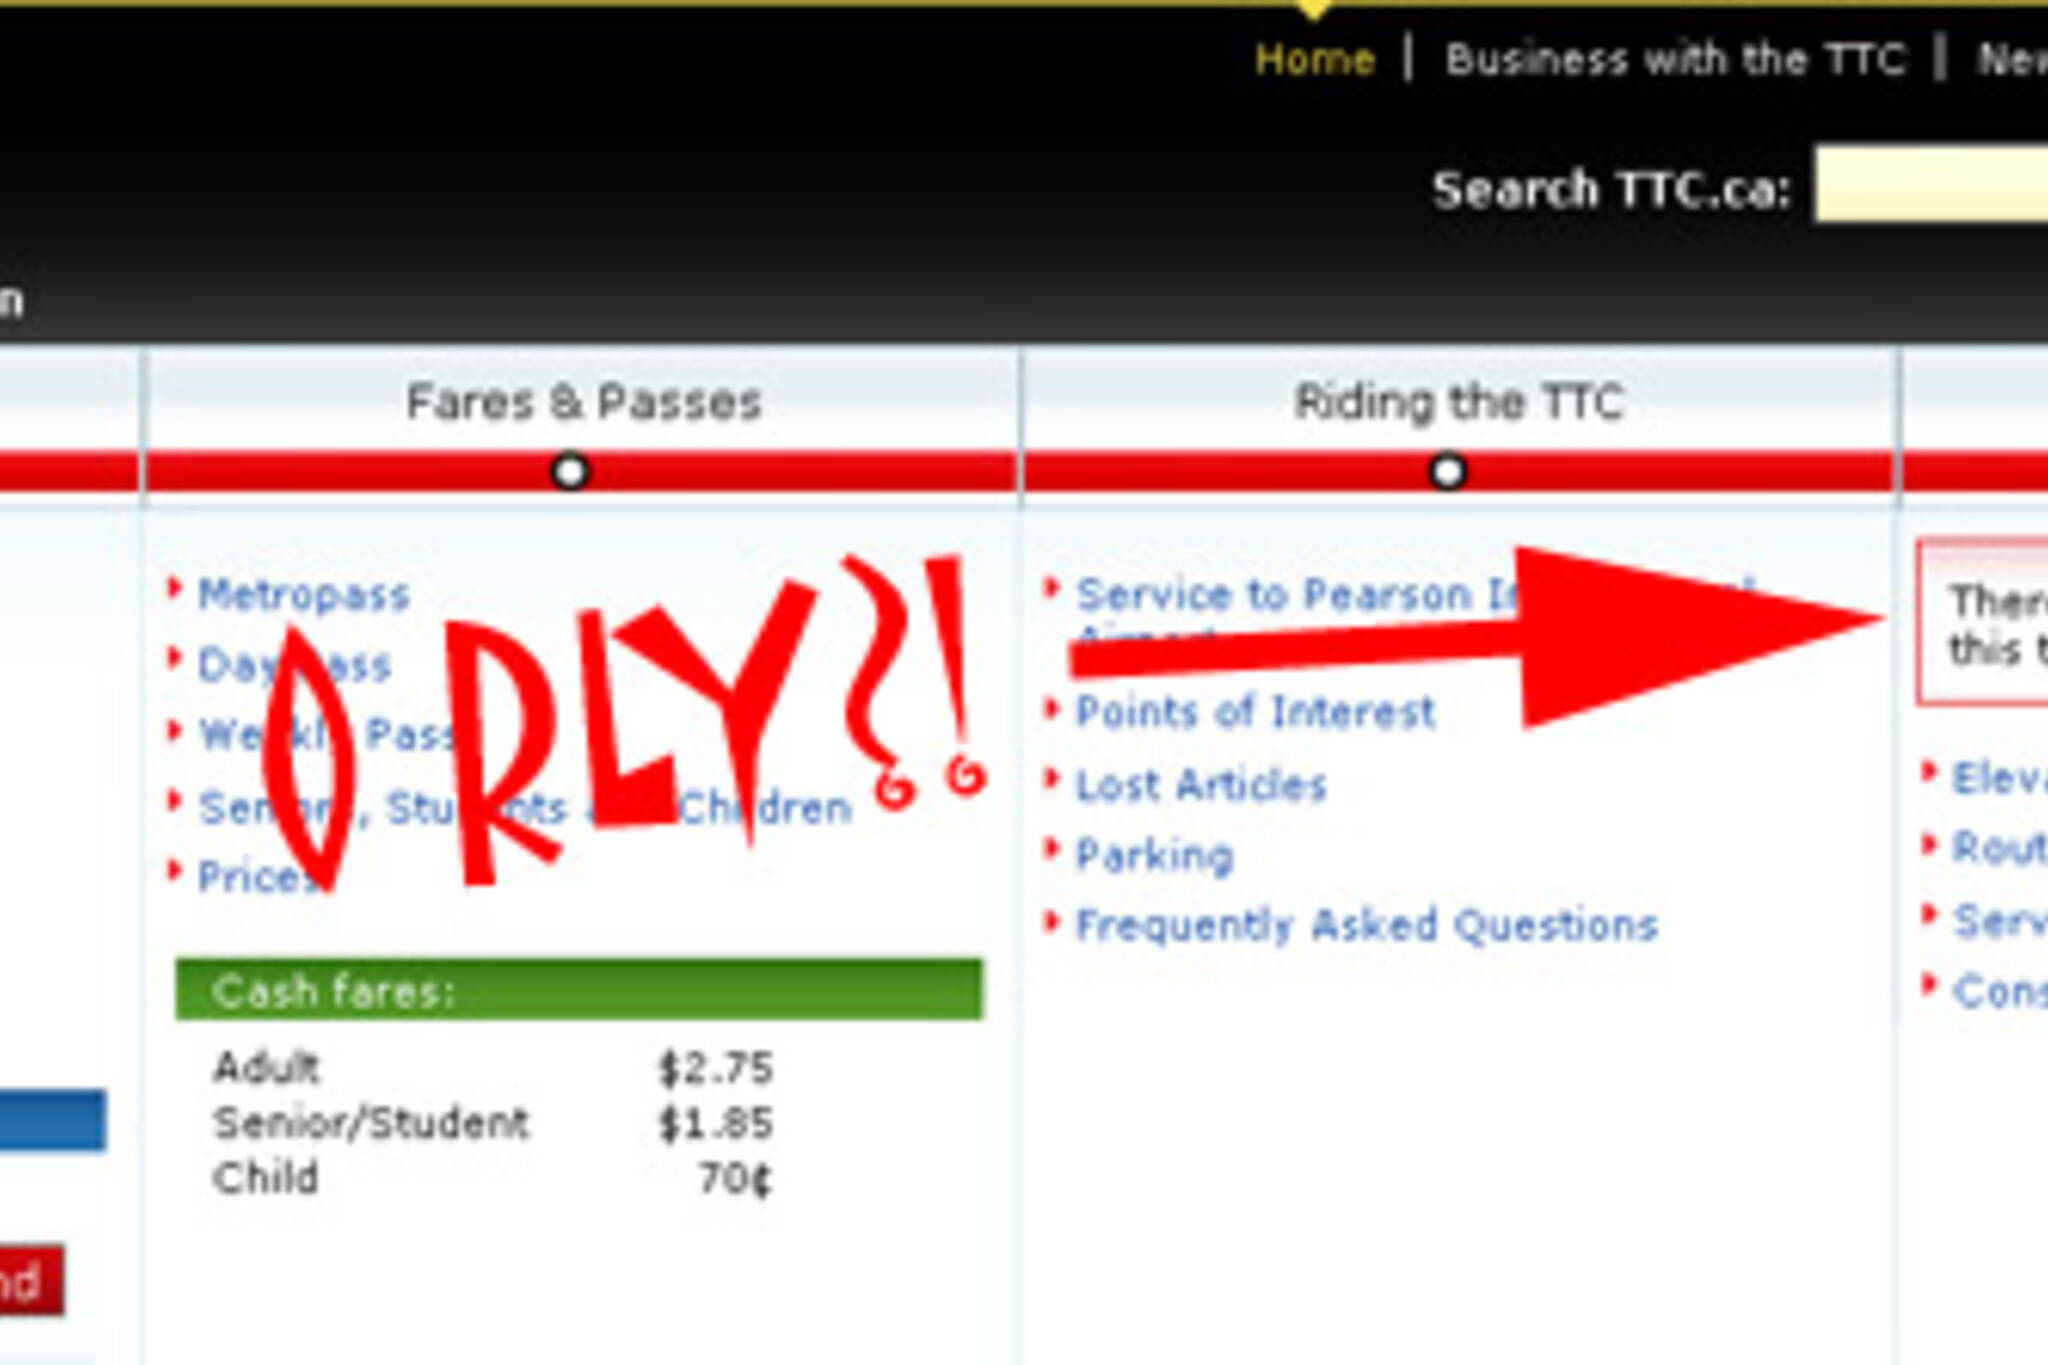 ttc service disruptions not working